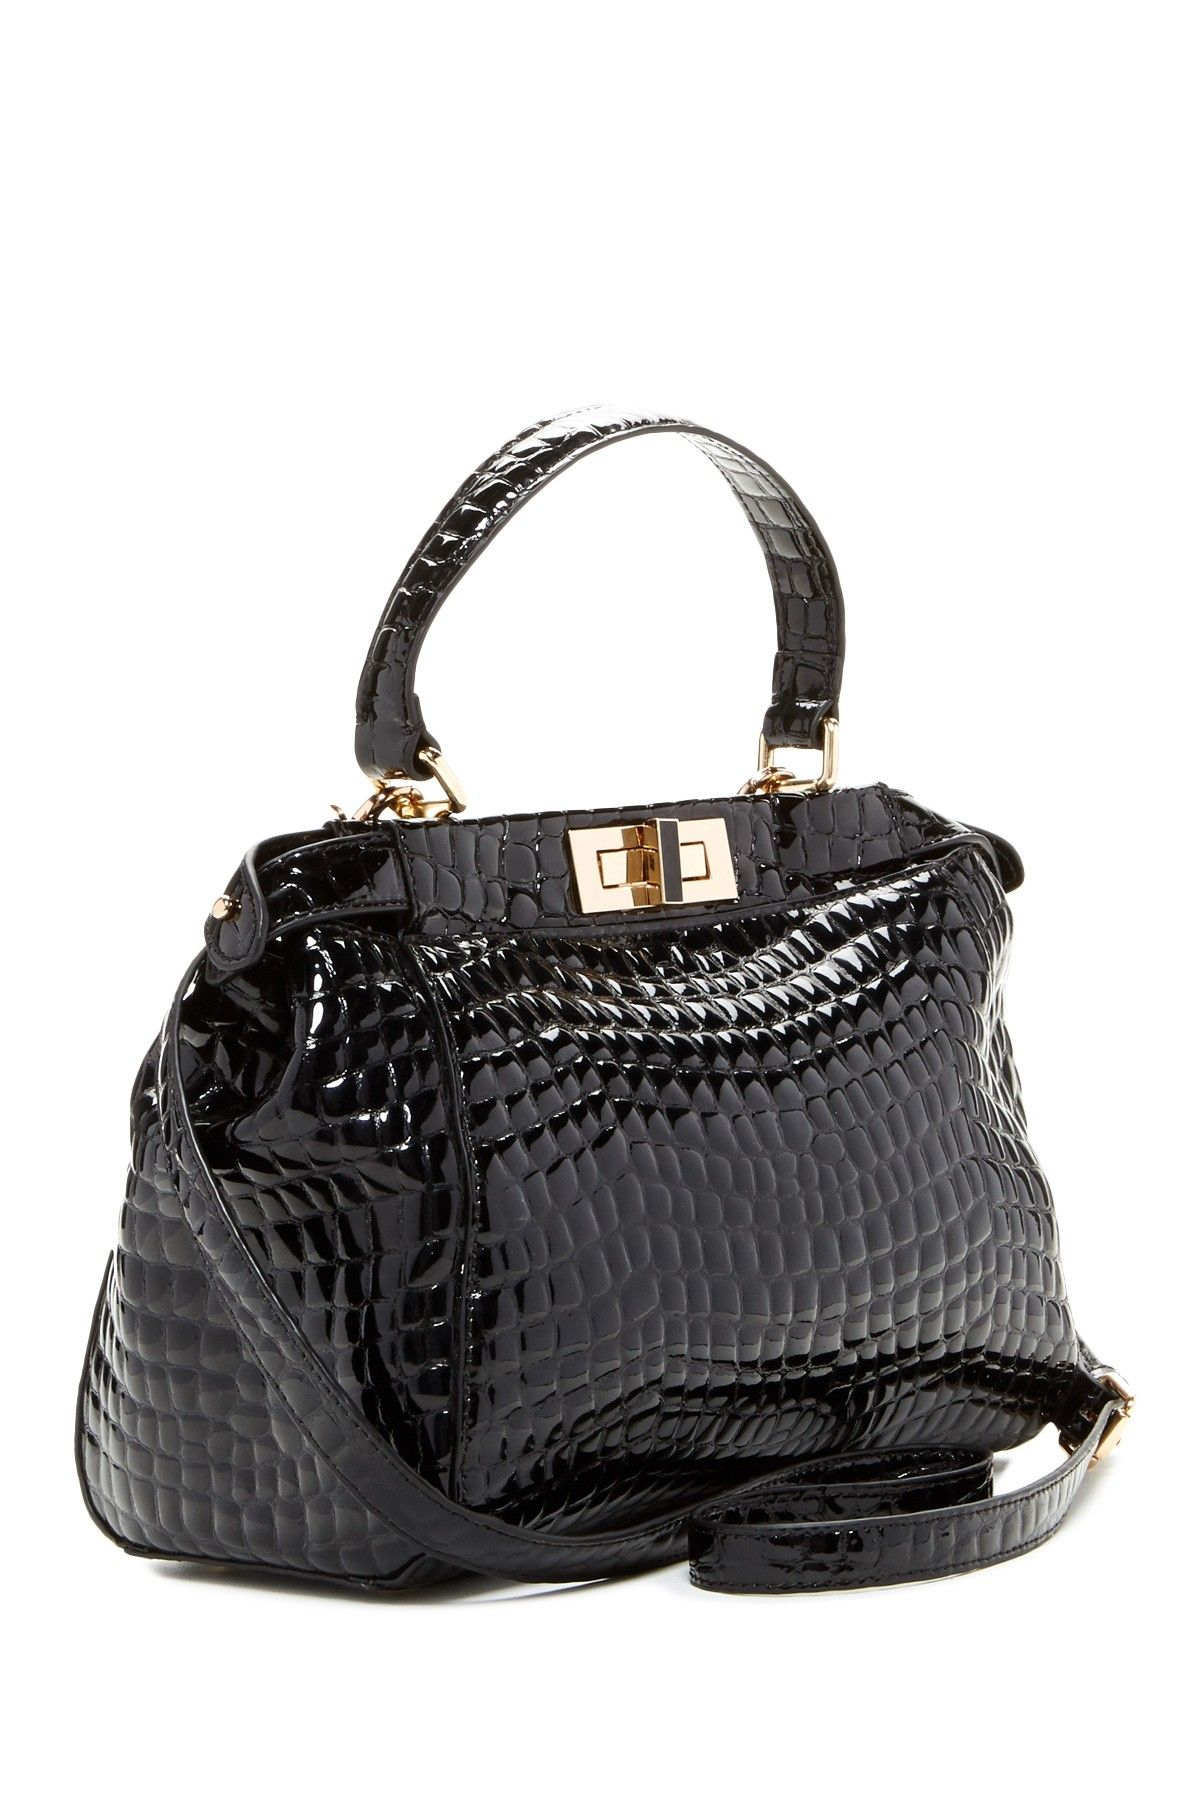 Turn Lock Satchel By Zenith Handbags On Hautelook